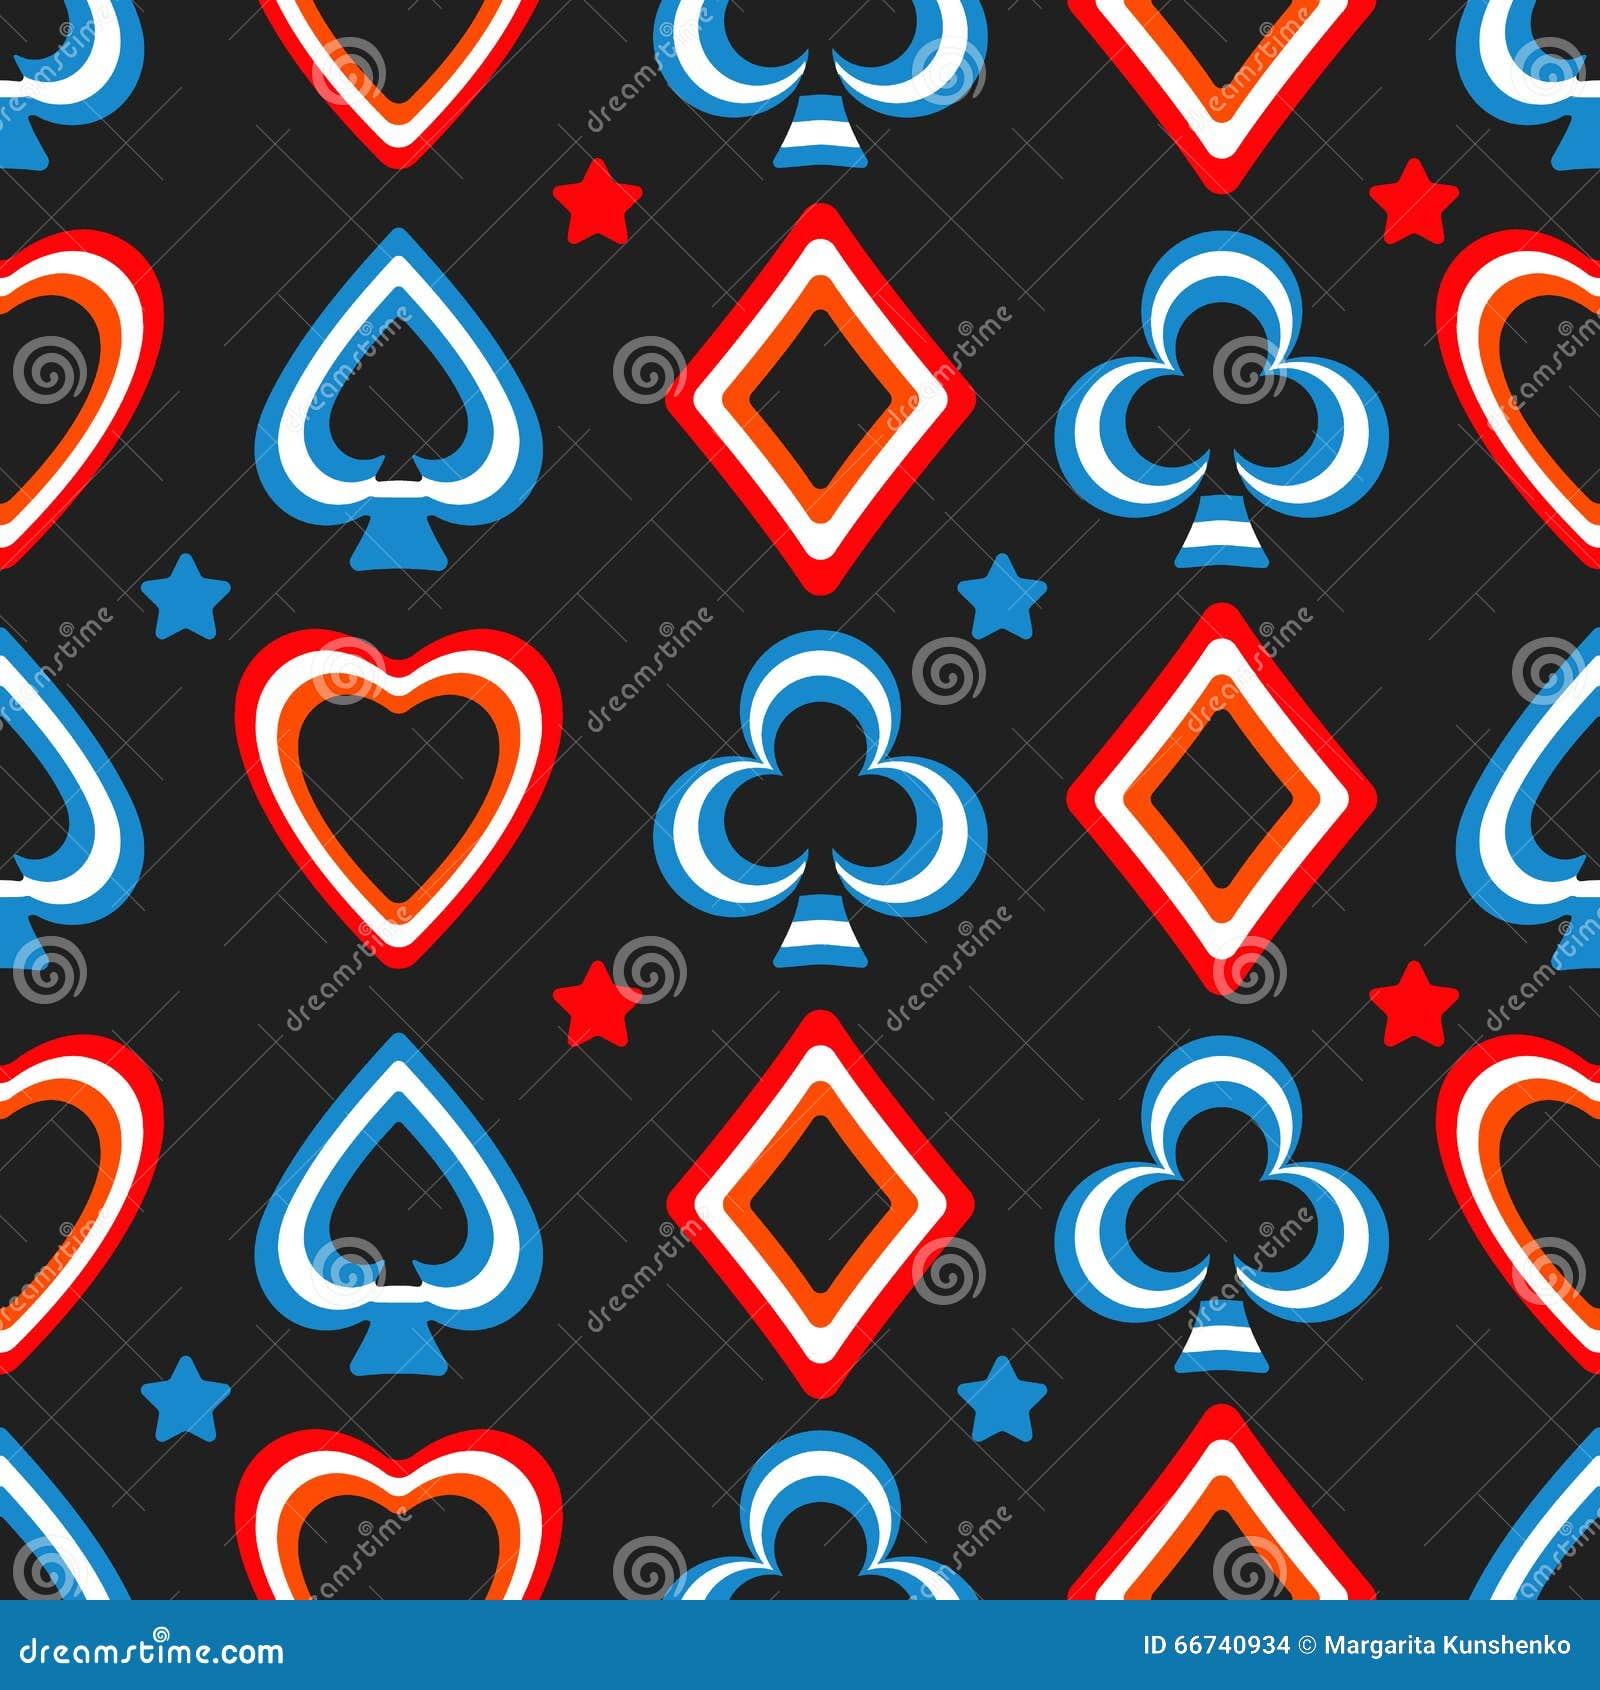 Playing cards pattern stock vector. Illustration of joker ...